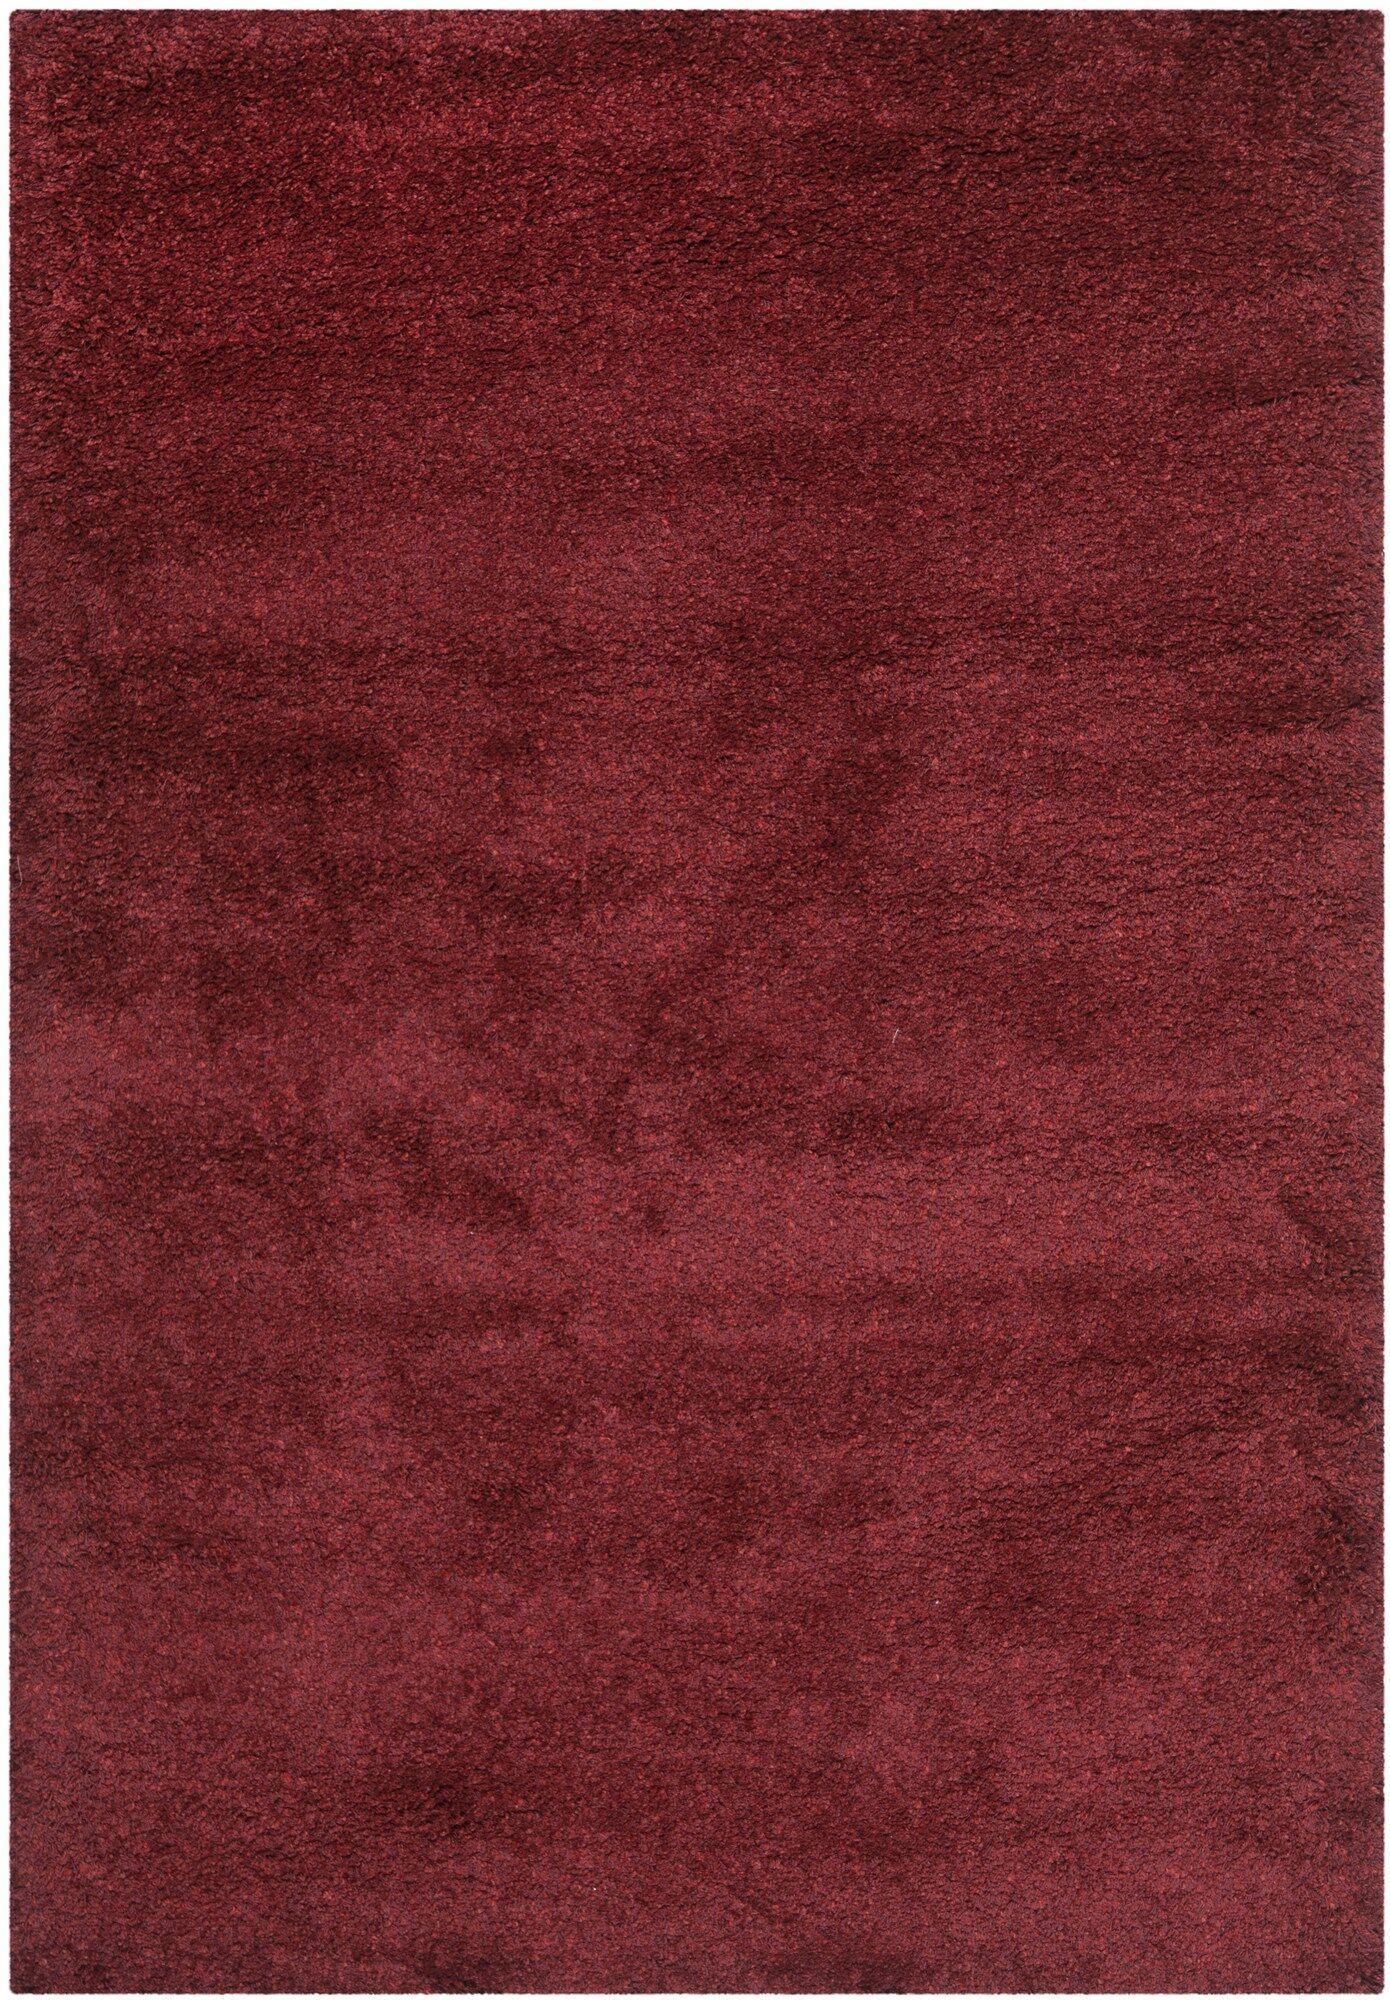 Psyche Shag Maroon Area Rug Rug Size: Rectangle 5'3